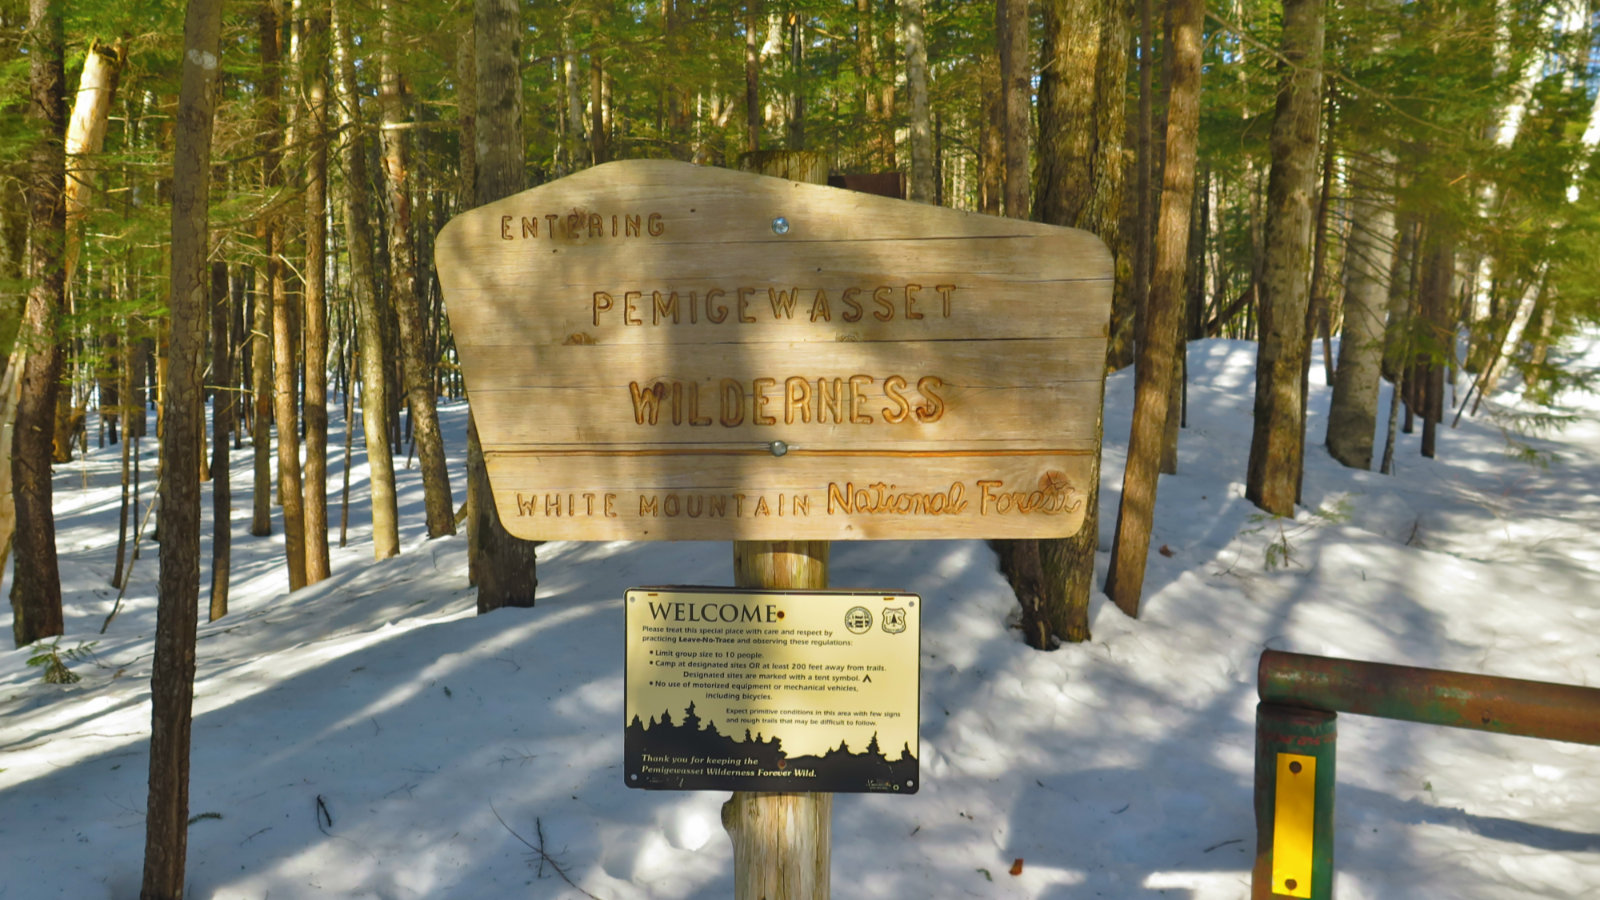 Pemi-East-Side-Wilderness-Sign-20200303